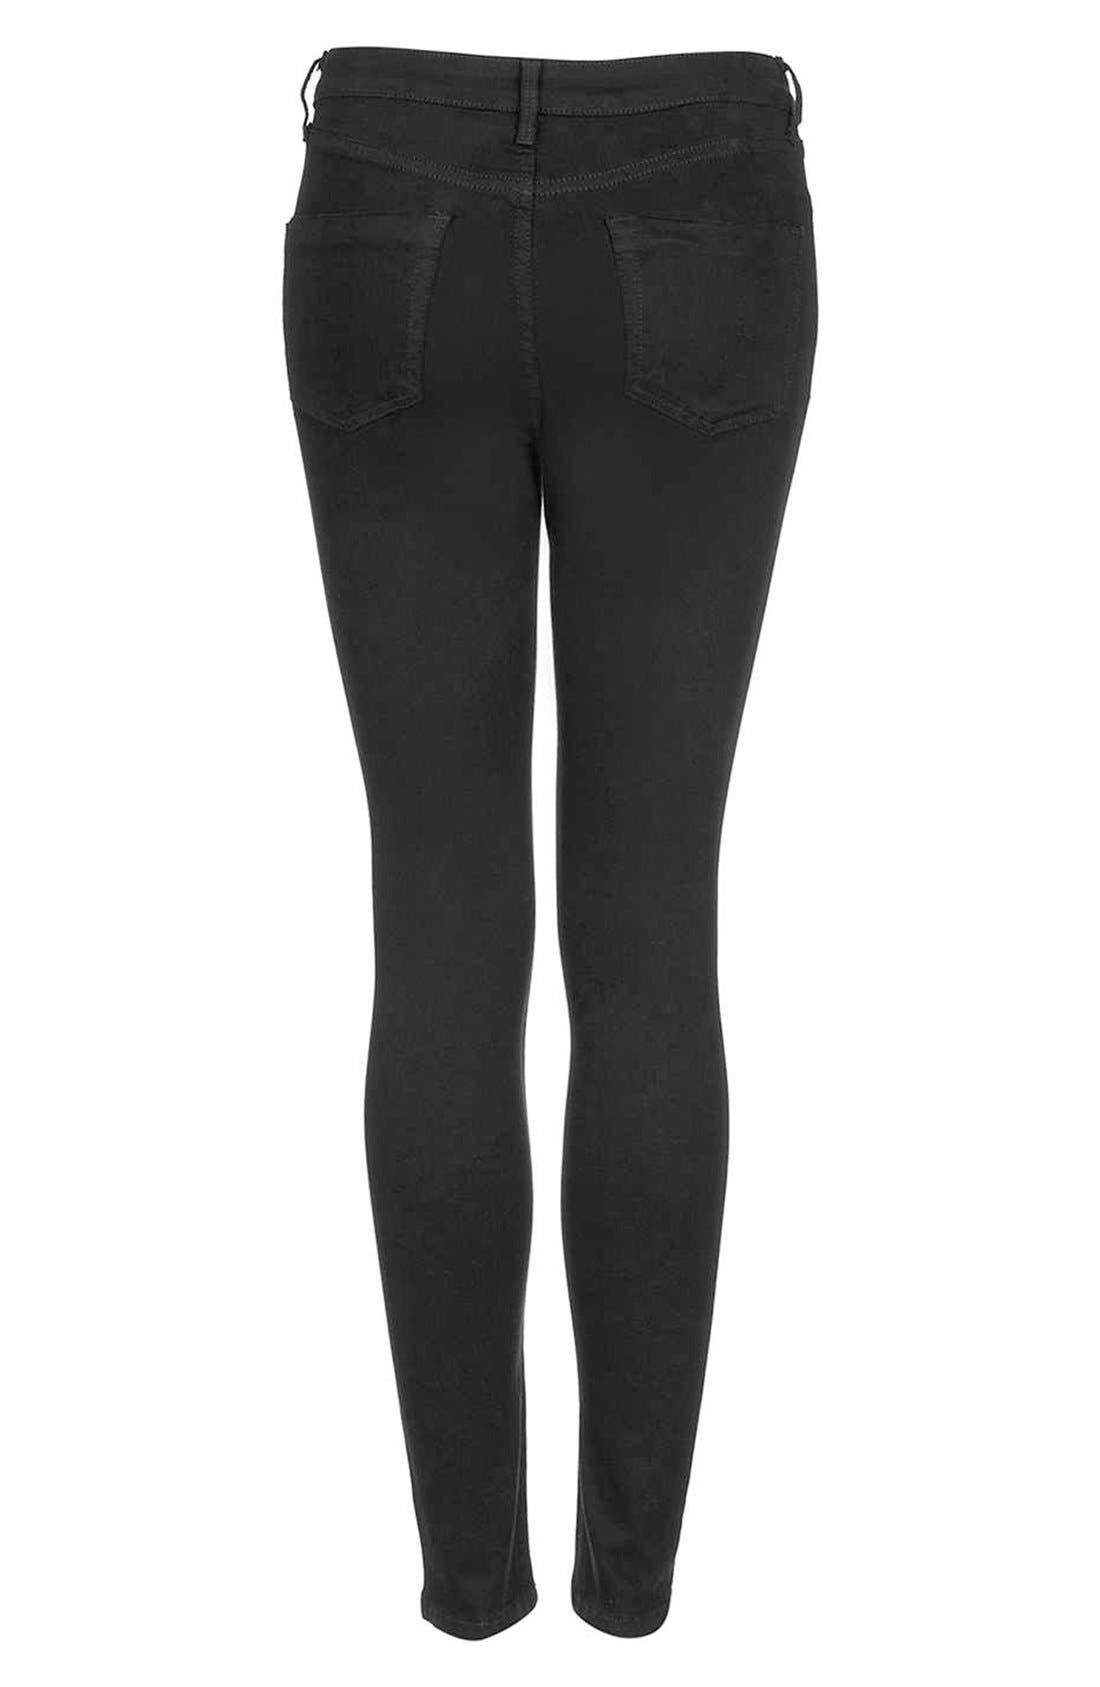 Alternate Image 2  - Topshop Moto 'Jamie' High Rise Skinny Jeans (Petite)